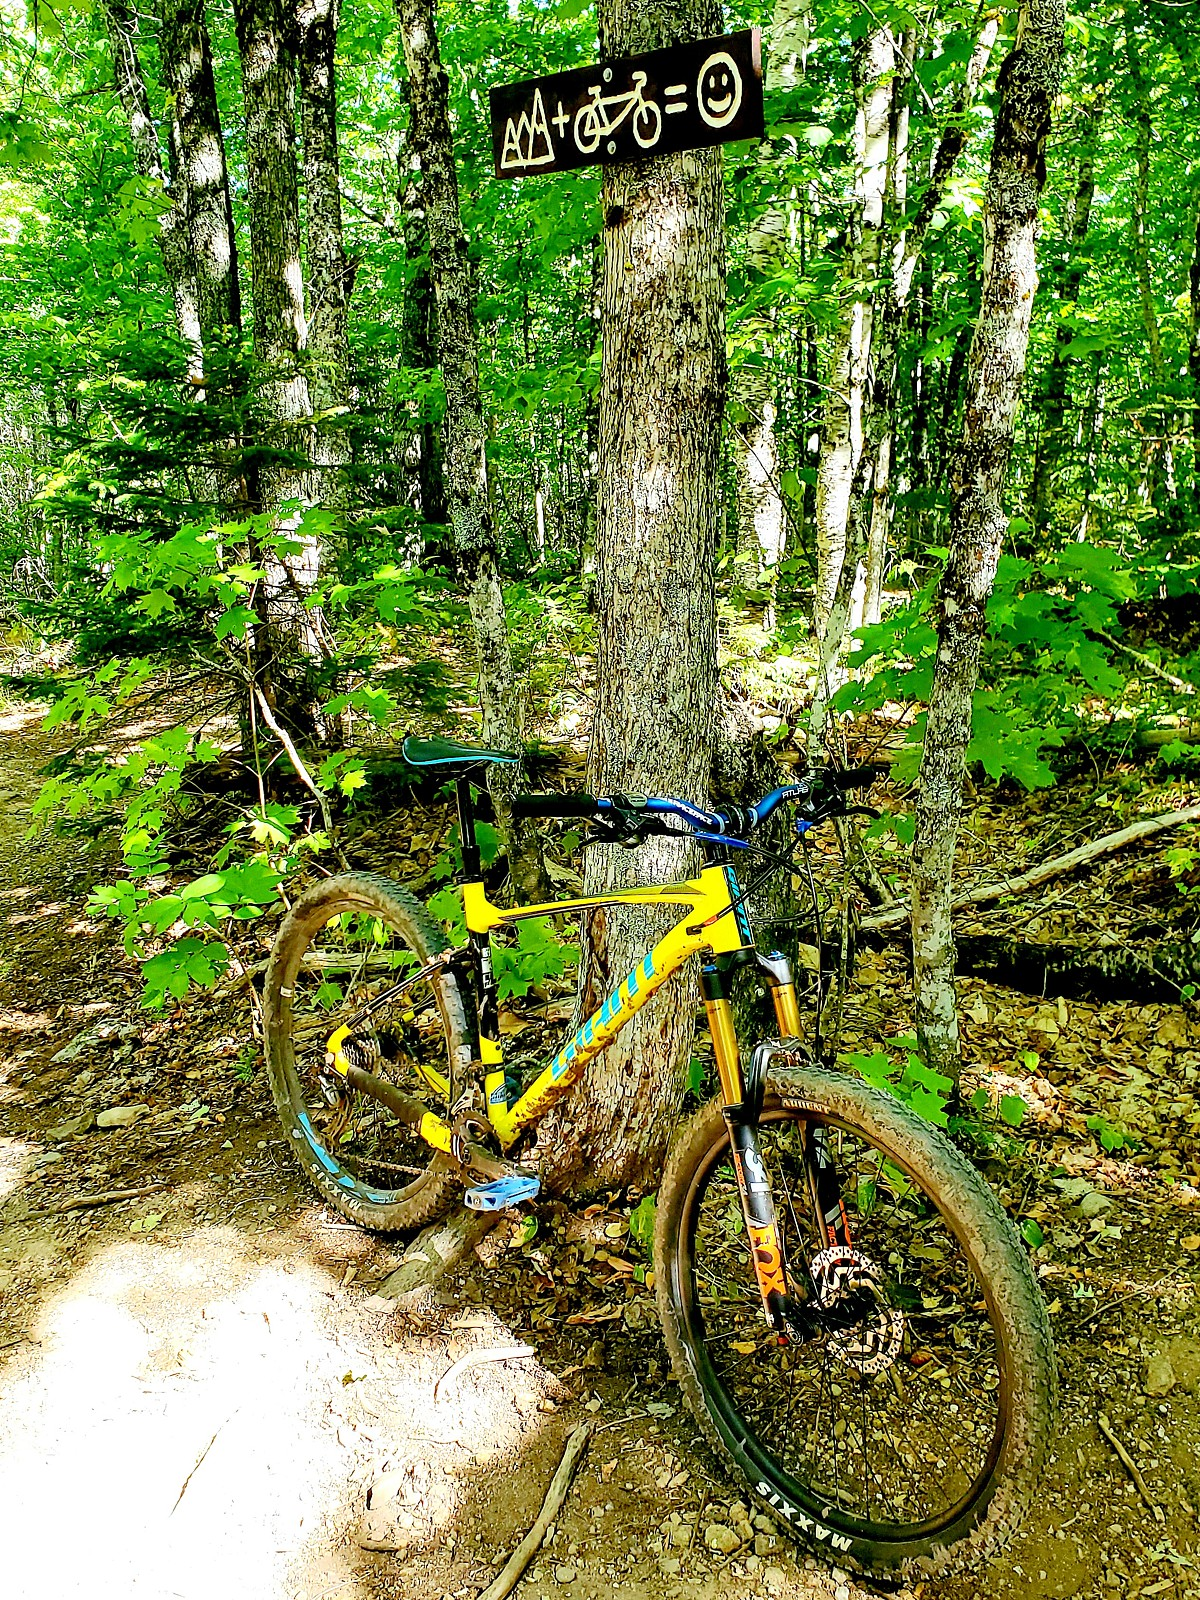 20201217 070211 - Sears23 - Mountain Biking Pictures - Vital MTB